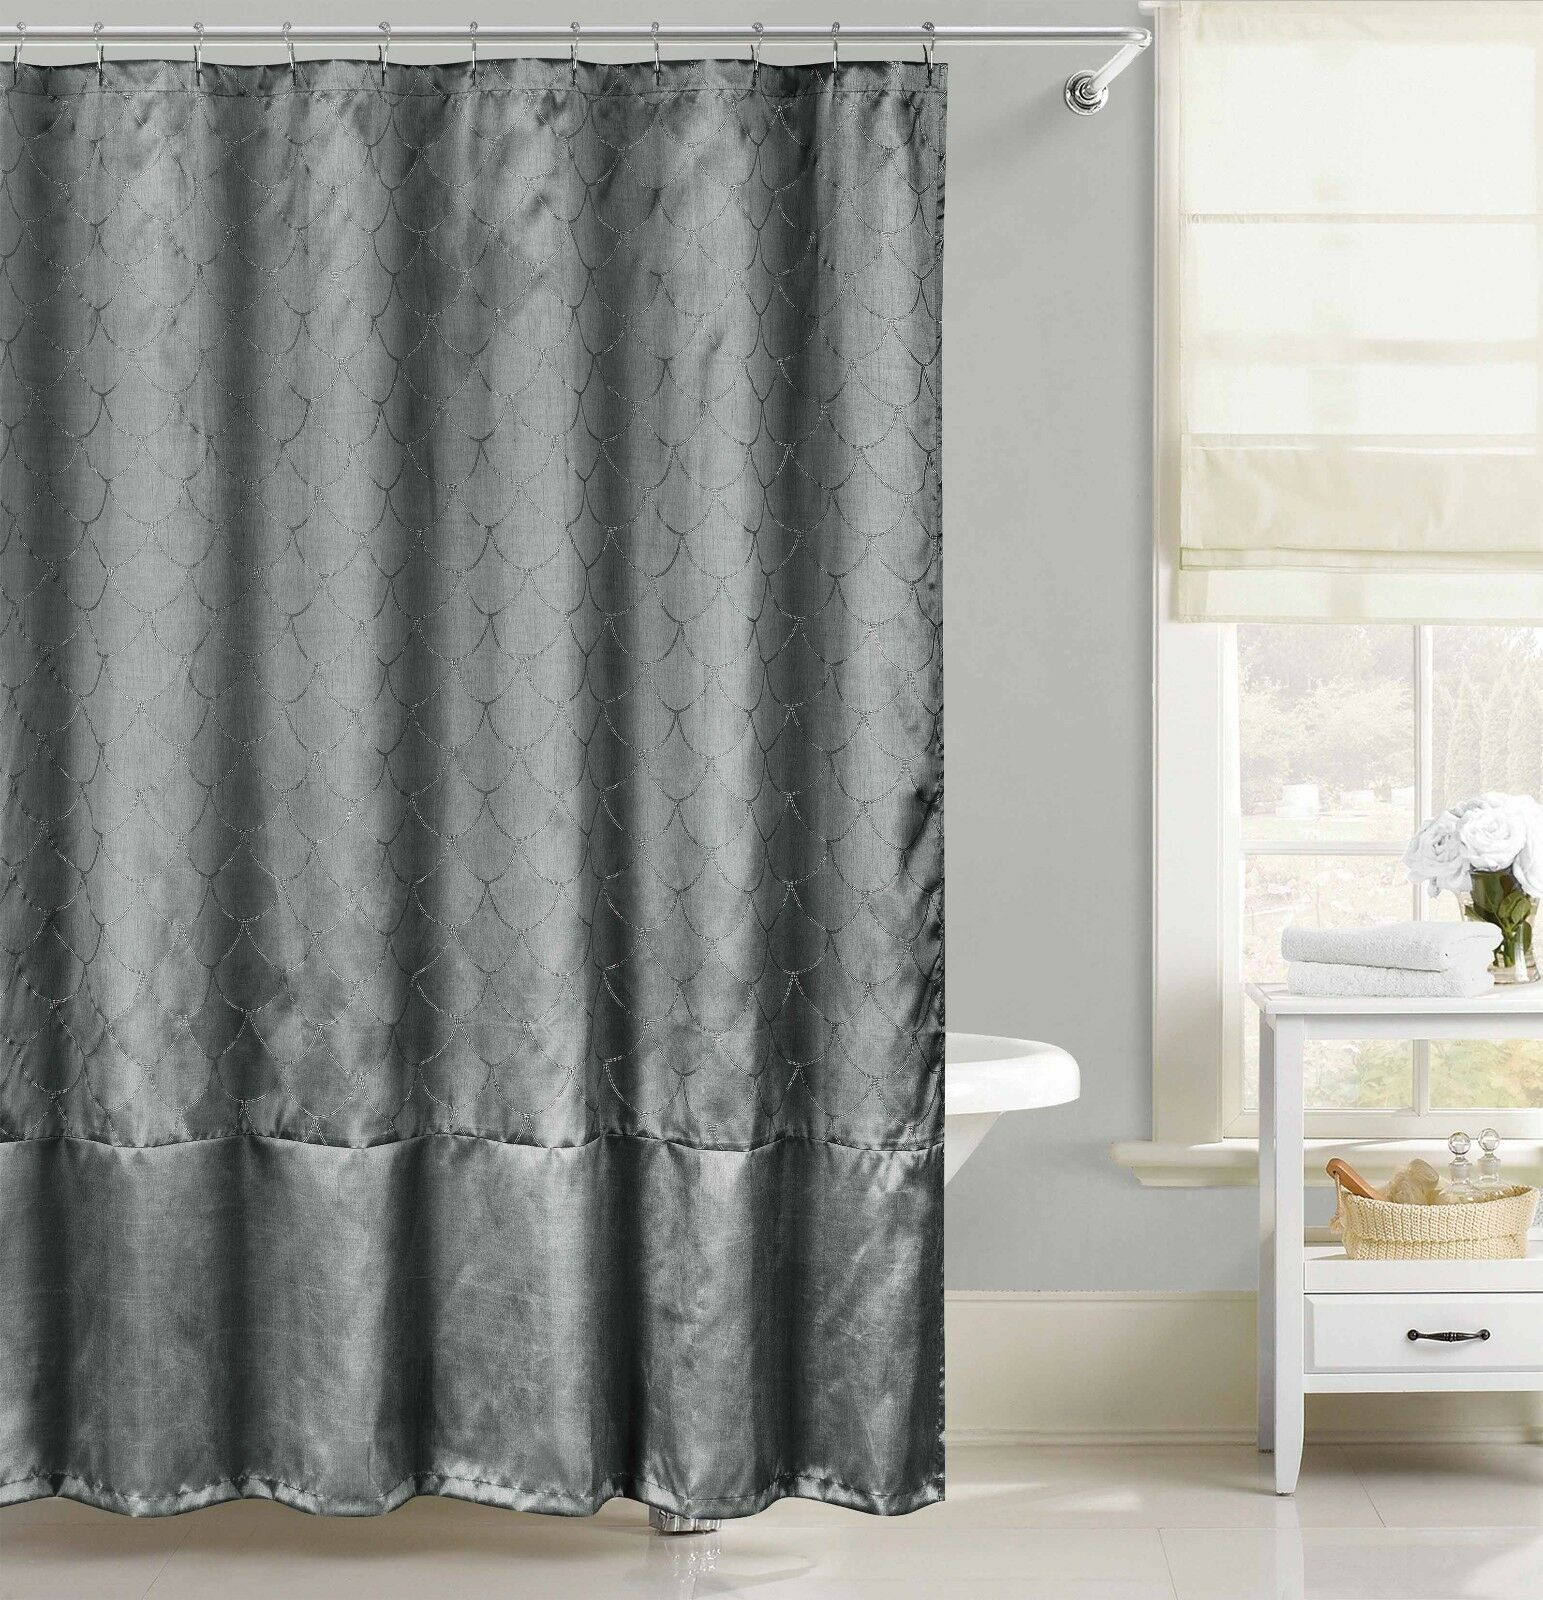 Faux Silk Fabric Shower Curtain Metallic Raised Pin Dot Fishscale ...